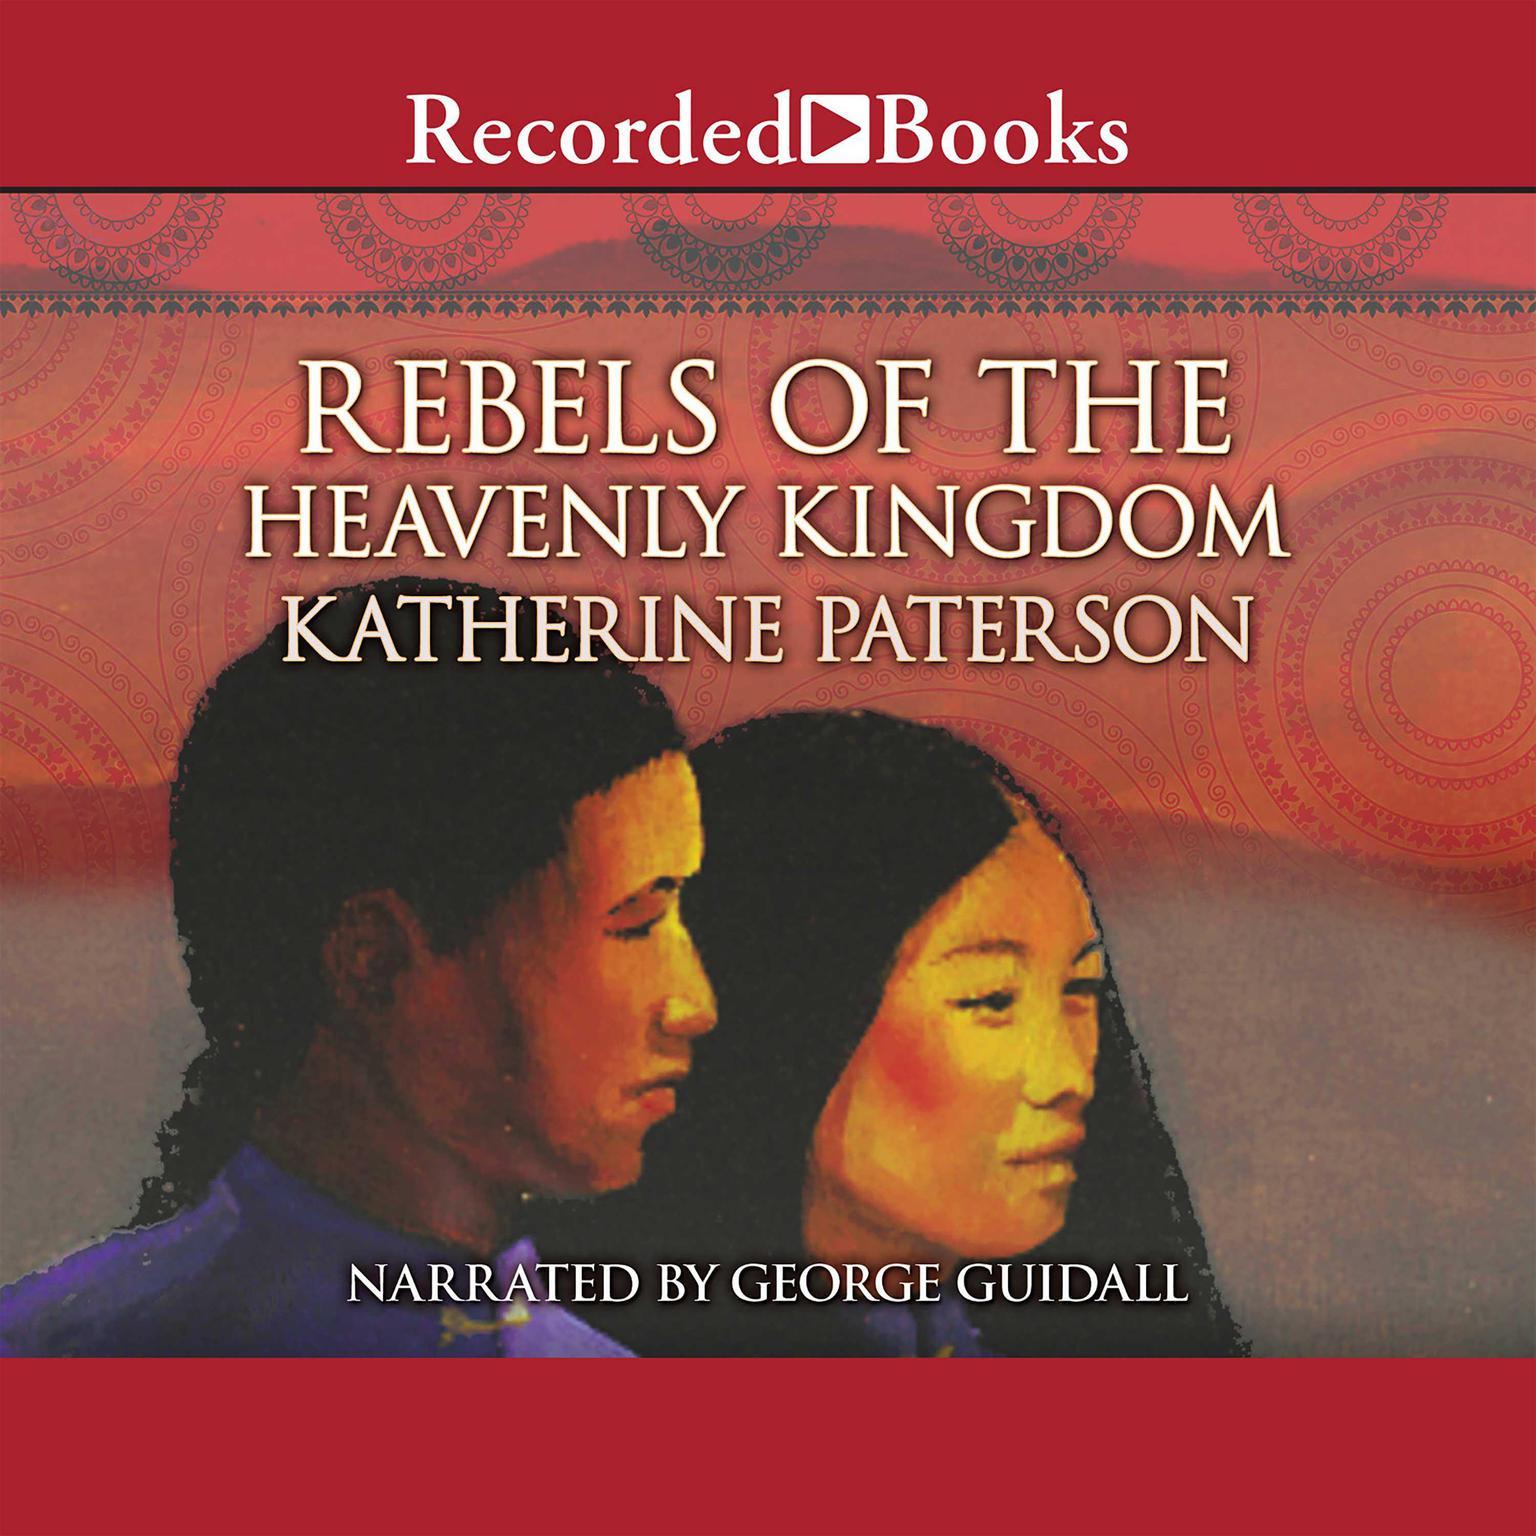 Printable Rebels of the Heavenly Kingdom Audiobook Cover Art